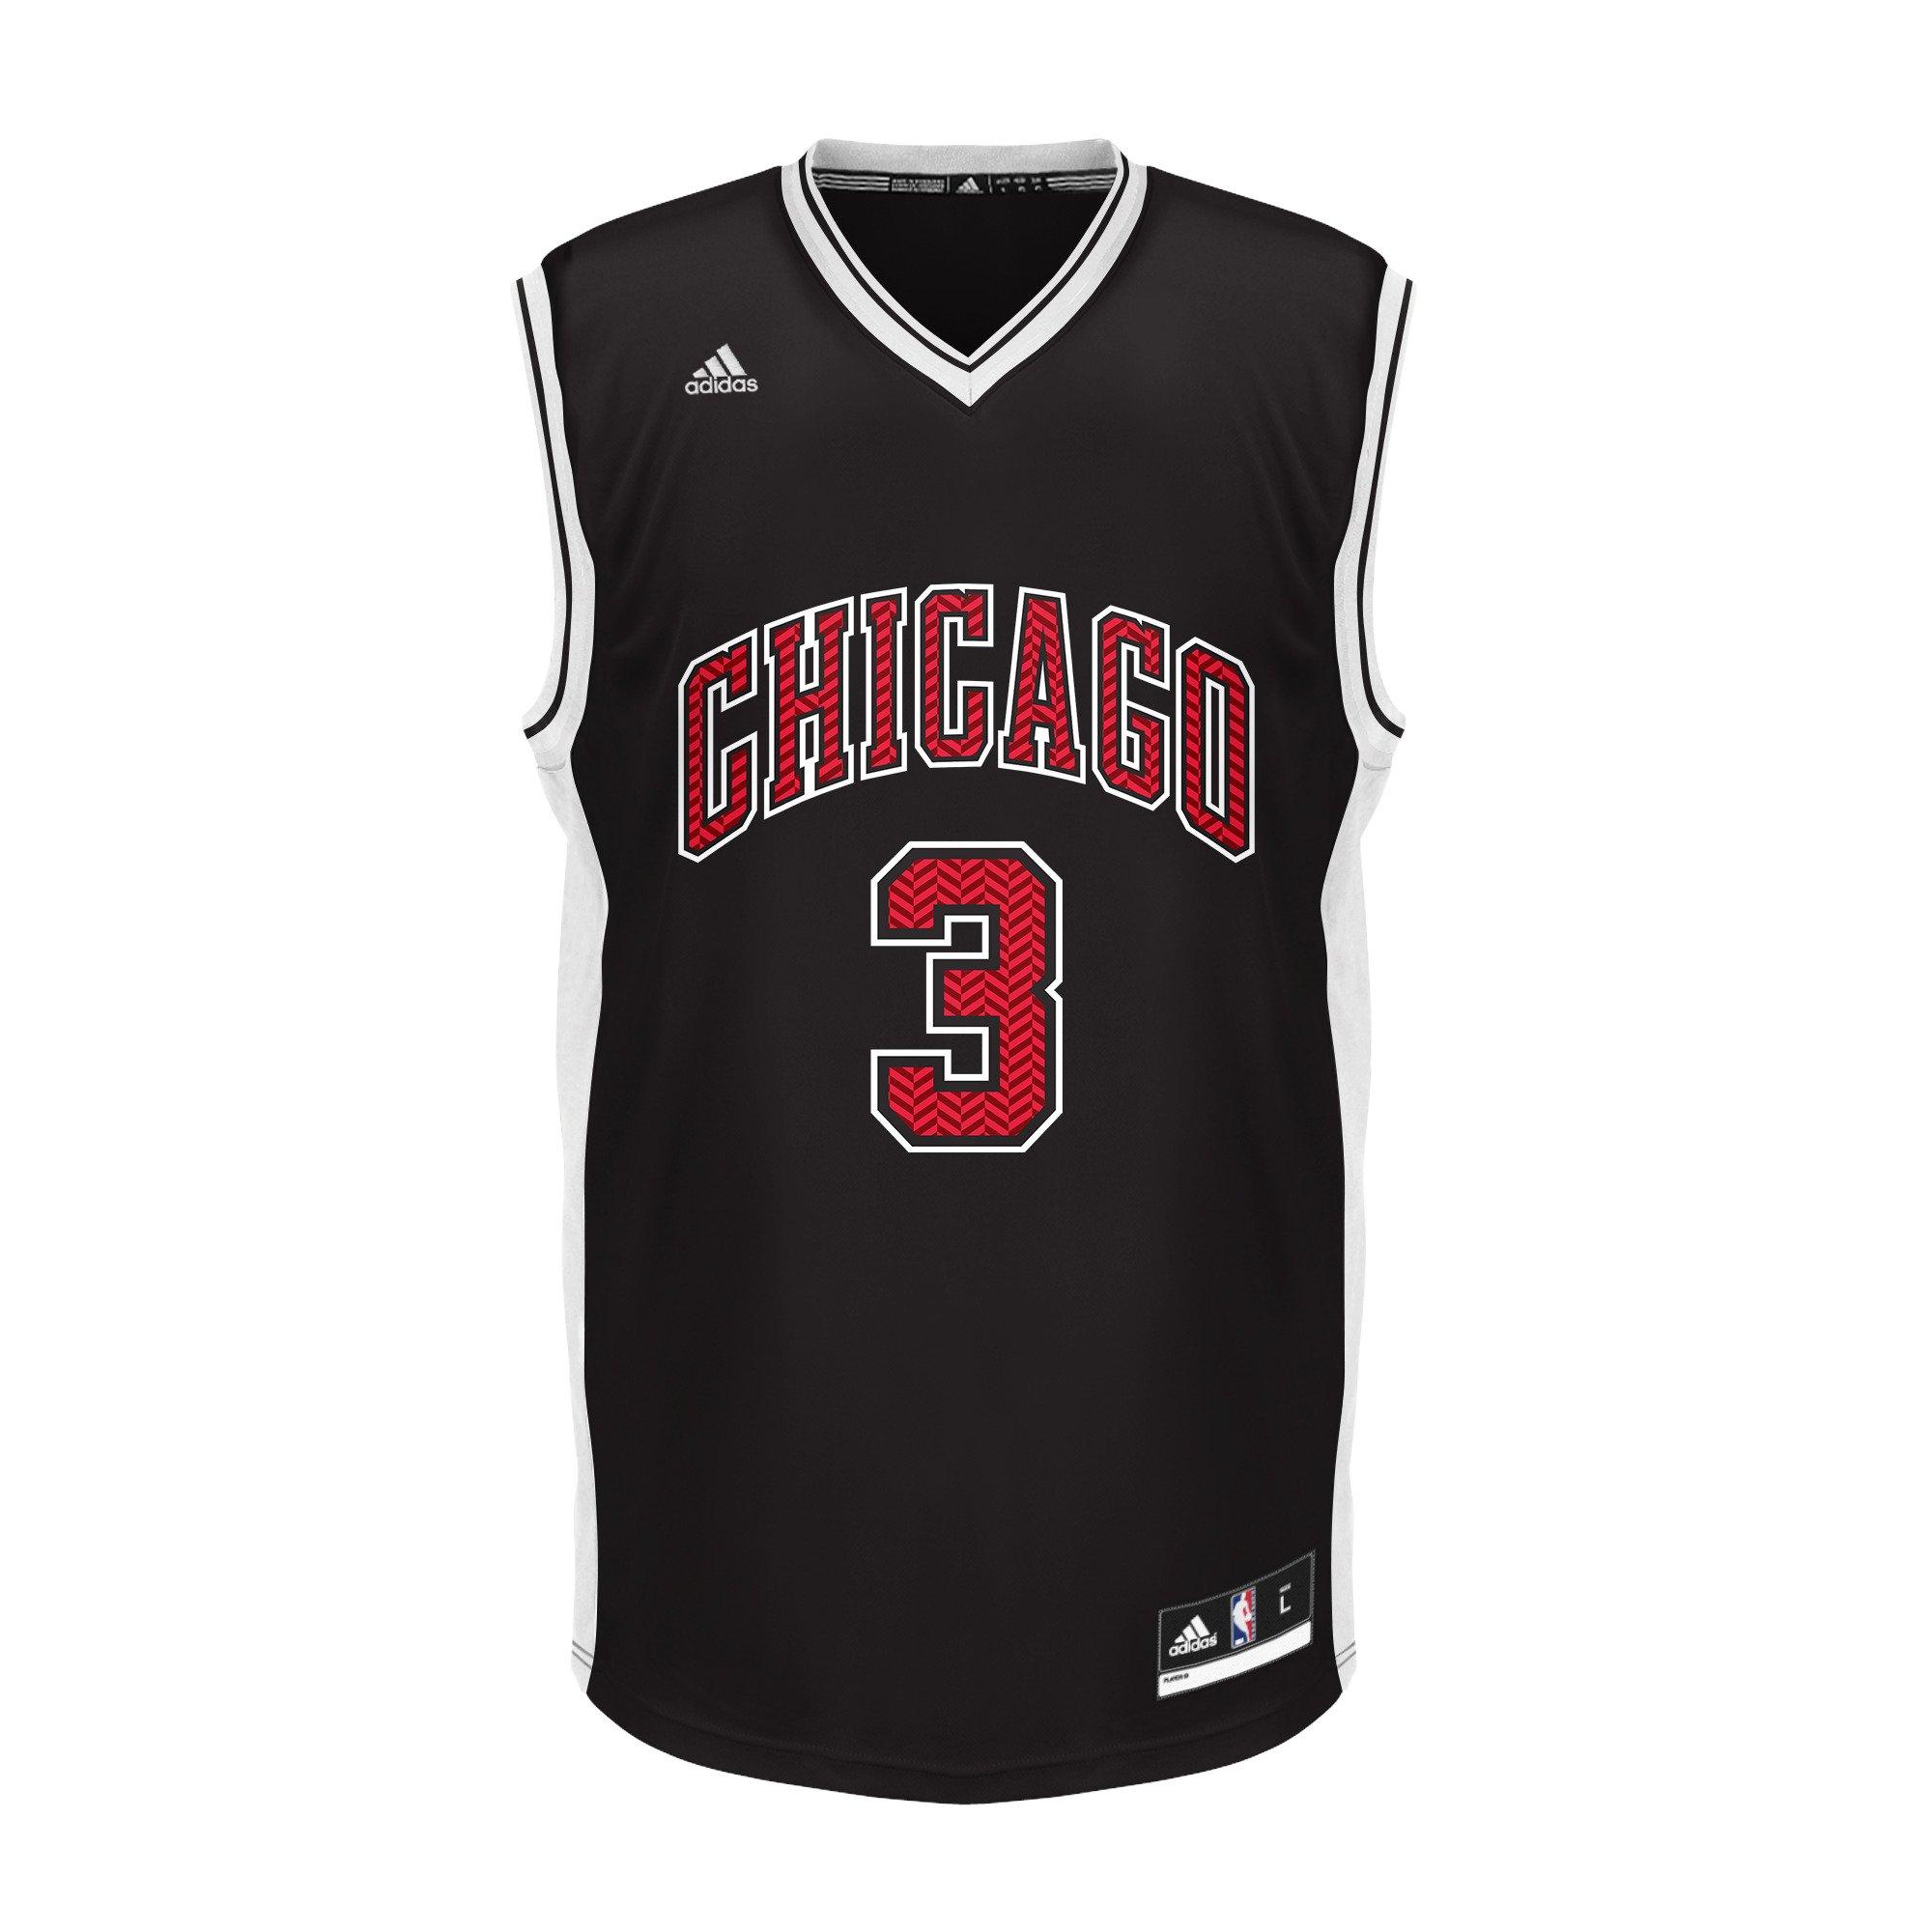 sports shoes 0411b 1f99c NBA Unisex Chicago Bulls Dwayne Wade Chevron Fashion Replica Jersey,  X-Large, Black